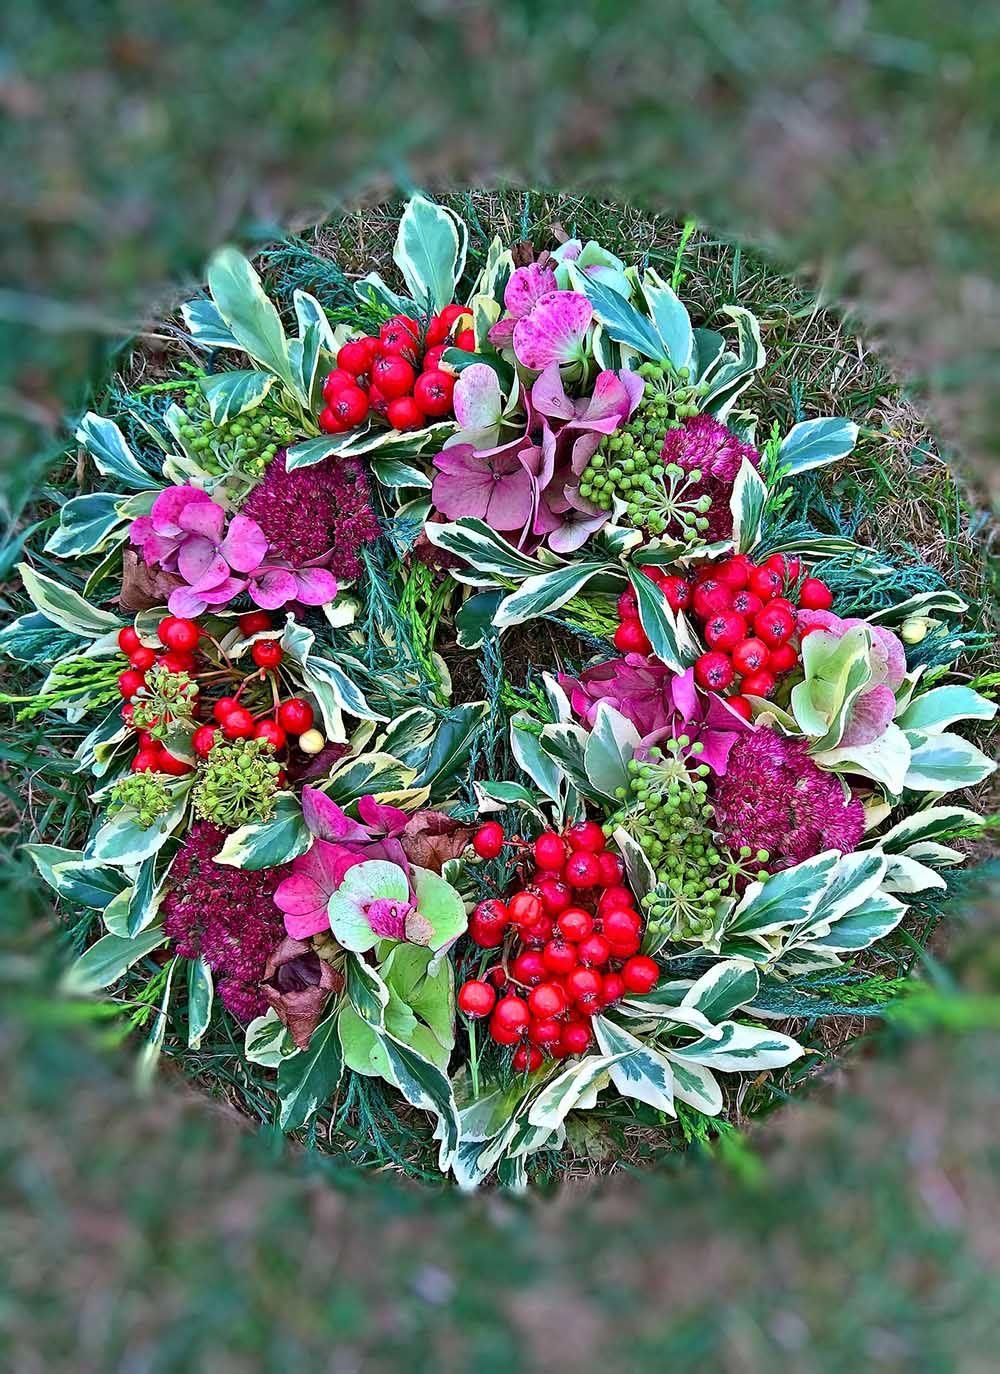 hydrangea-wreath-compressor.jpg